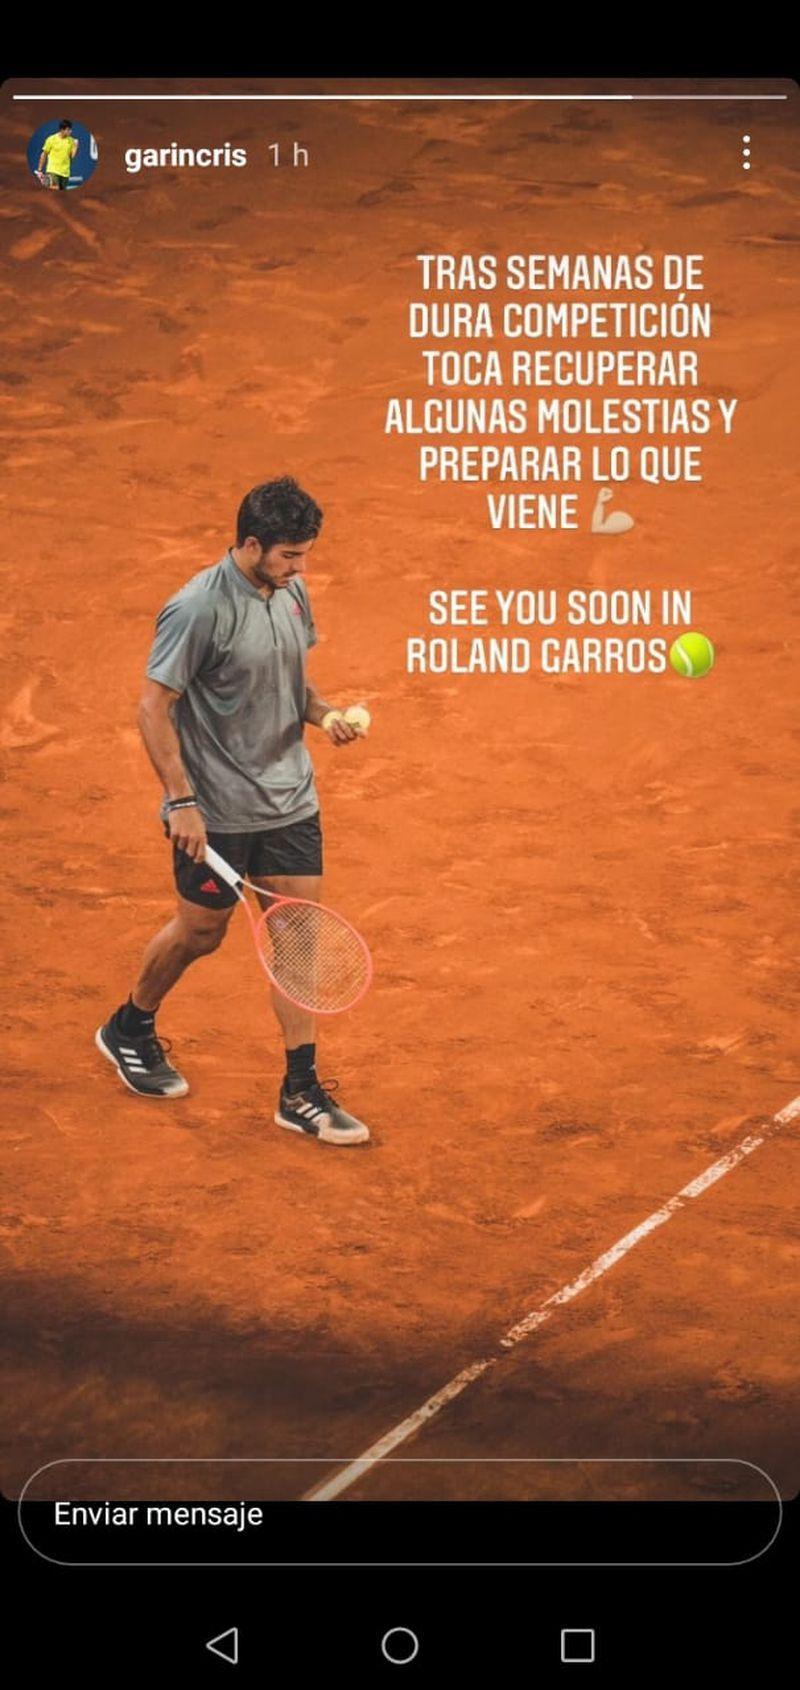 Christian Garin anunció que se bajaba del ATP de Ginebra para recuperar el físico pensando en Roland Garros.